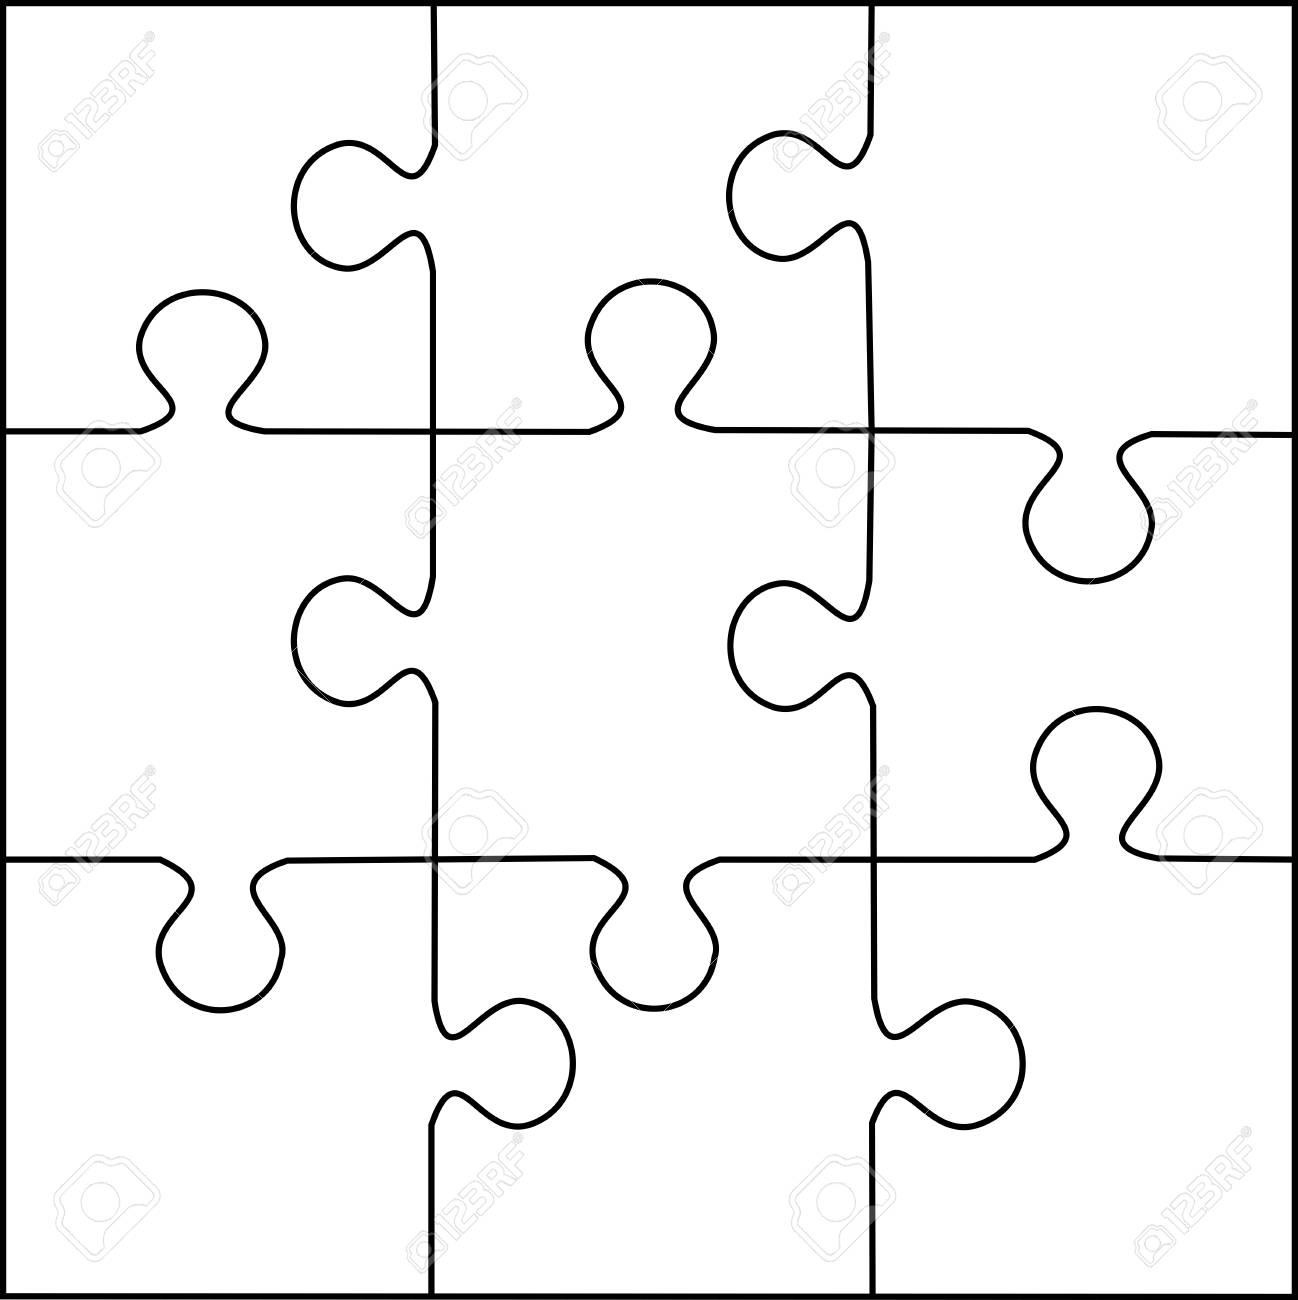 19 Printable Puzzle Piece Templates ᐅ Templatelab